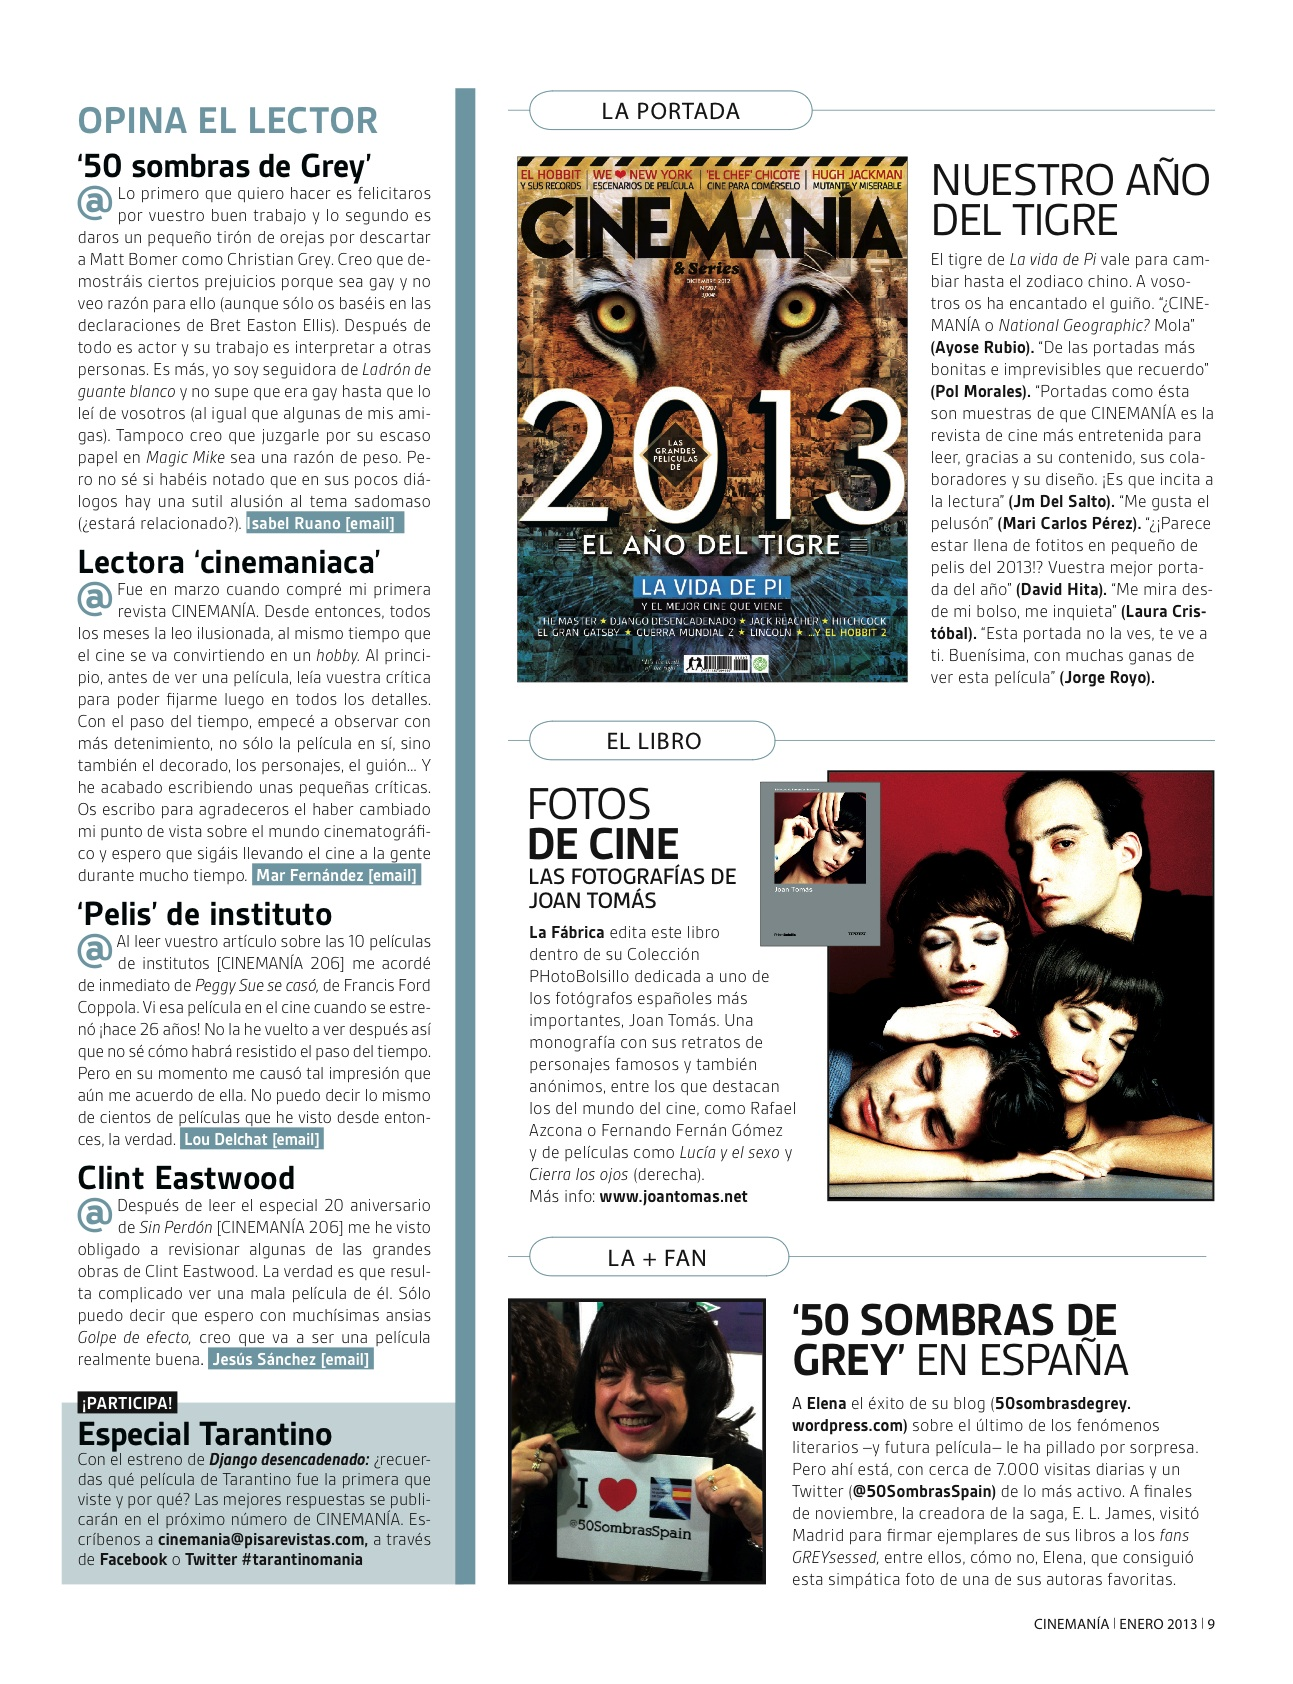 50 Sombras Spain en Cinemania